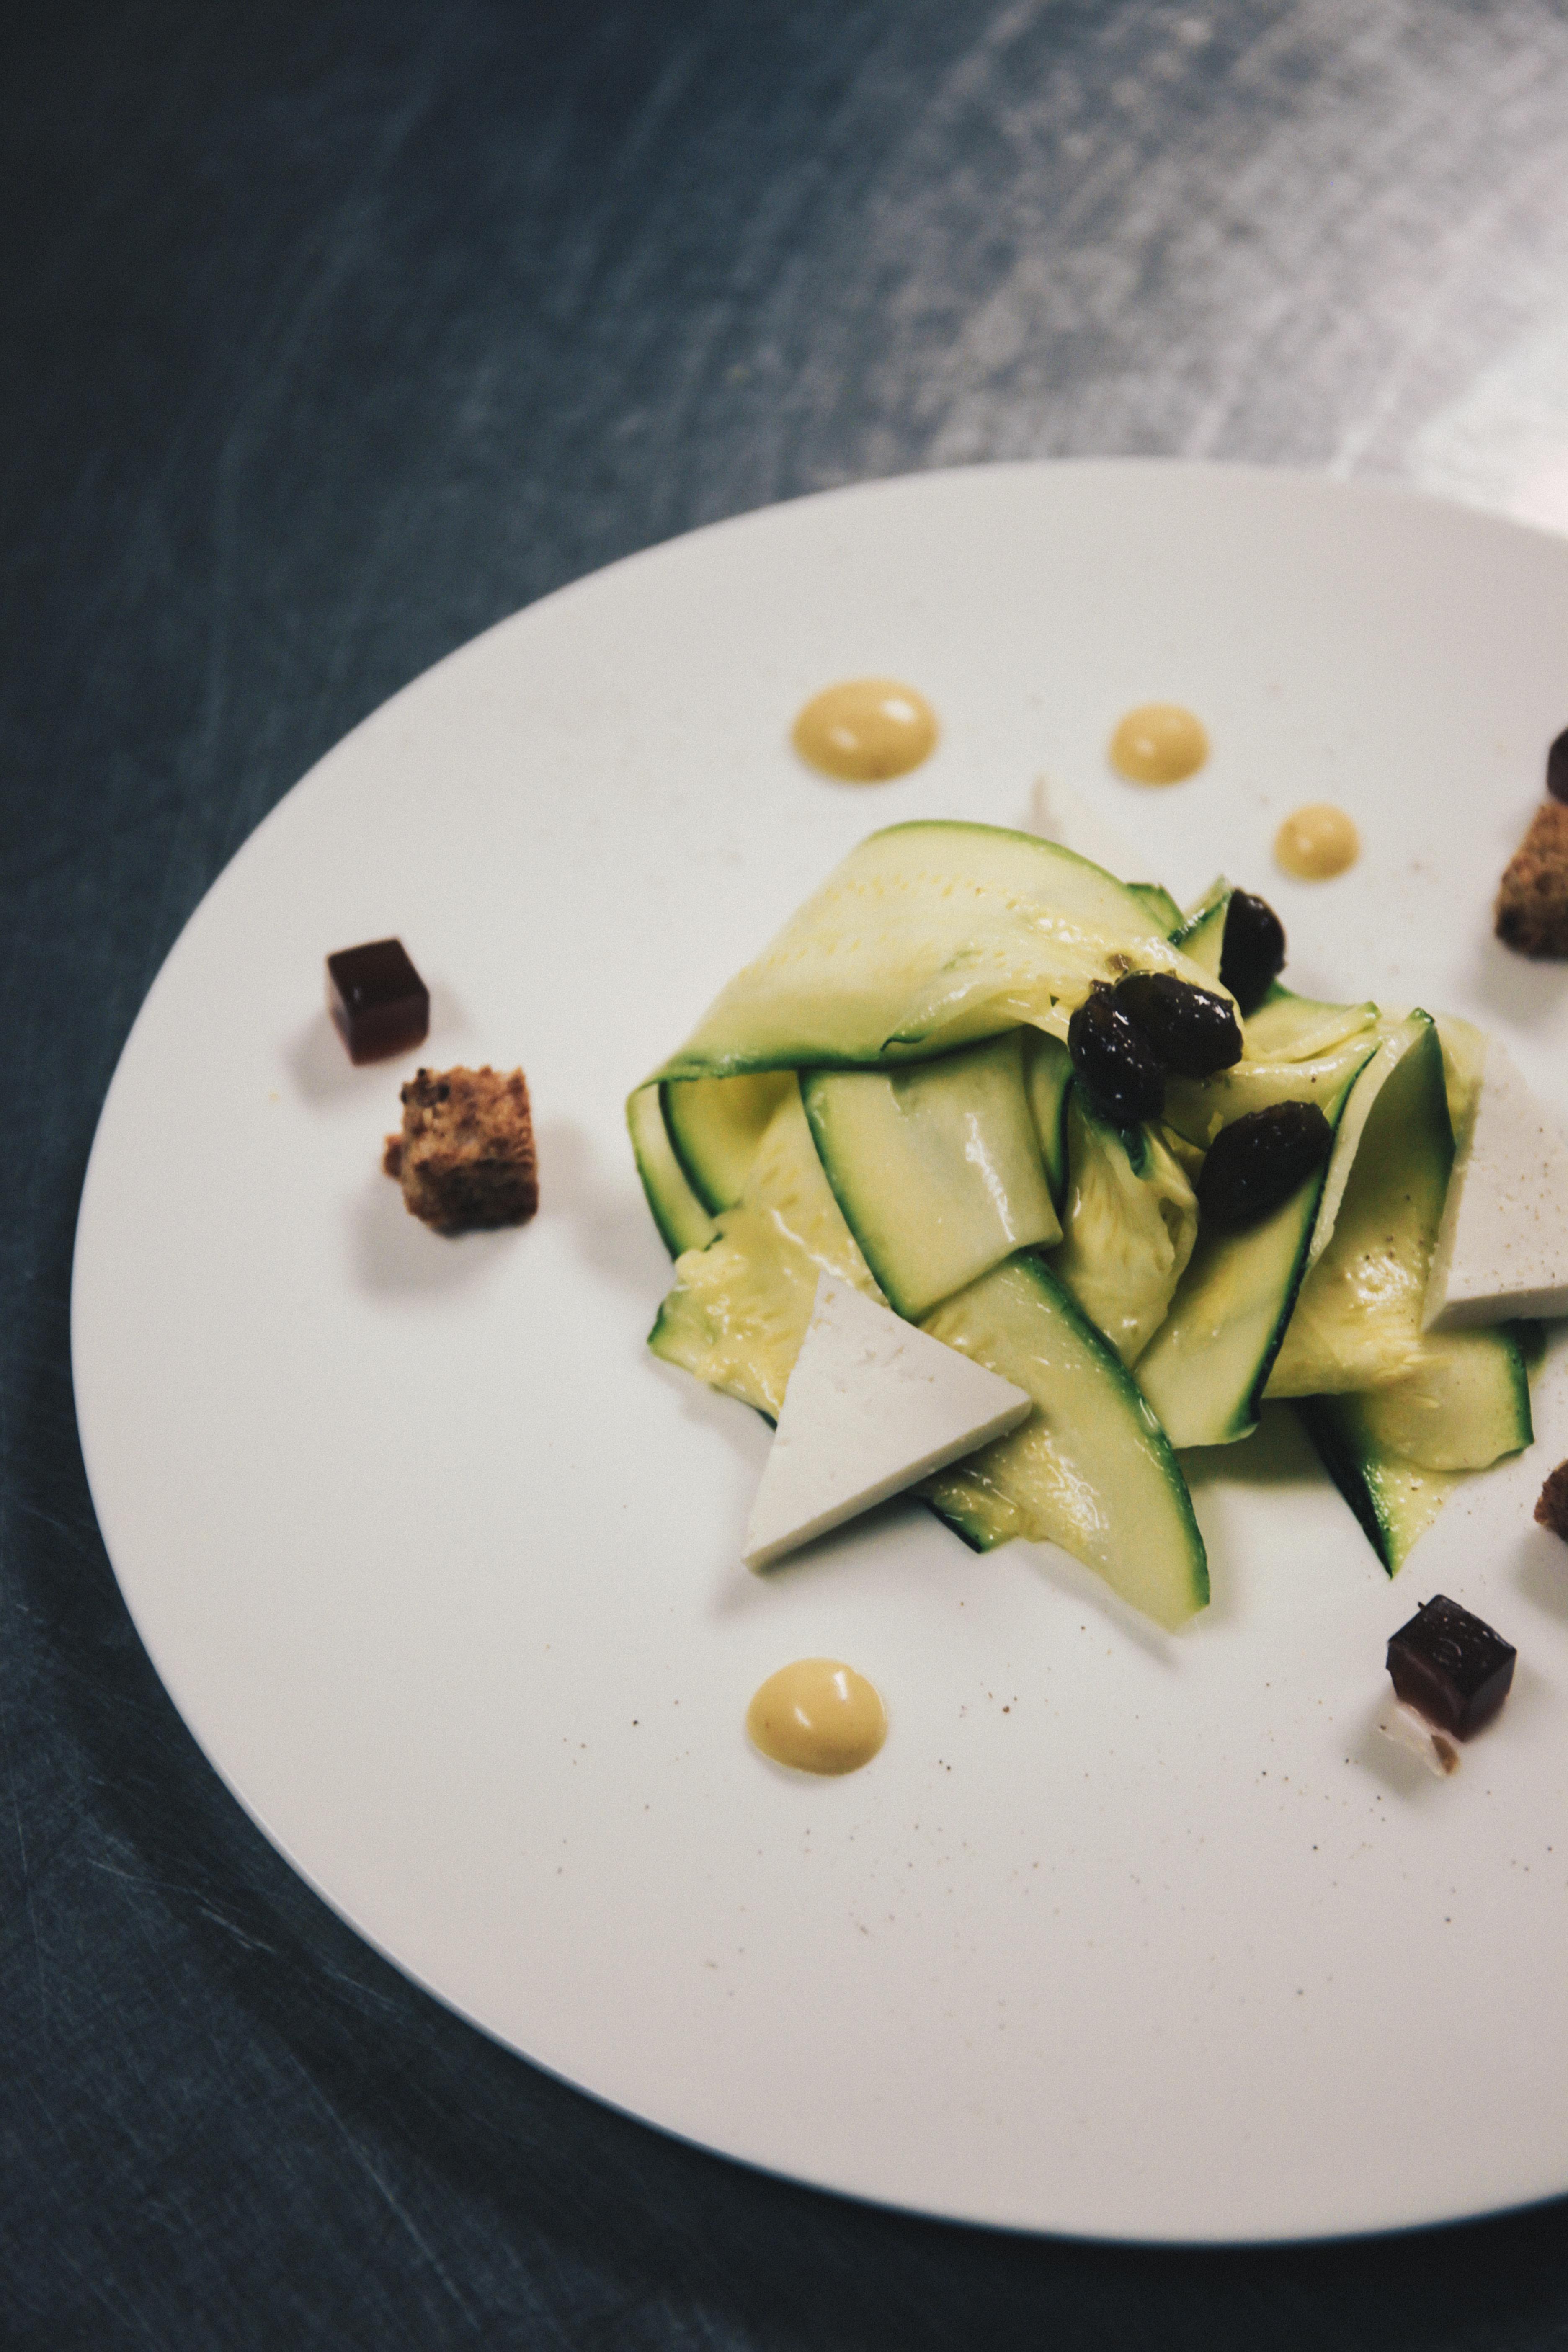 Penn Appétit – Marigold Kitchen: An Interview With Chef Andrew Kochan